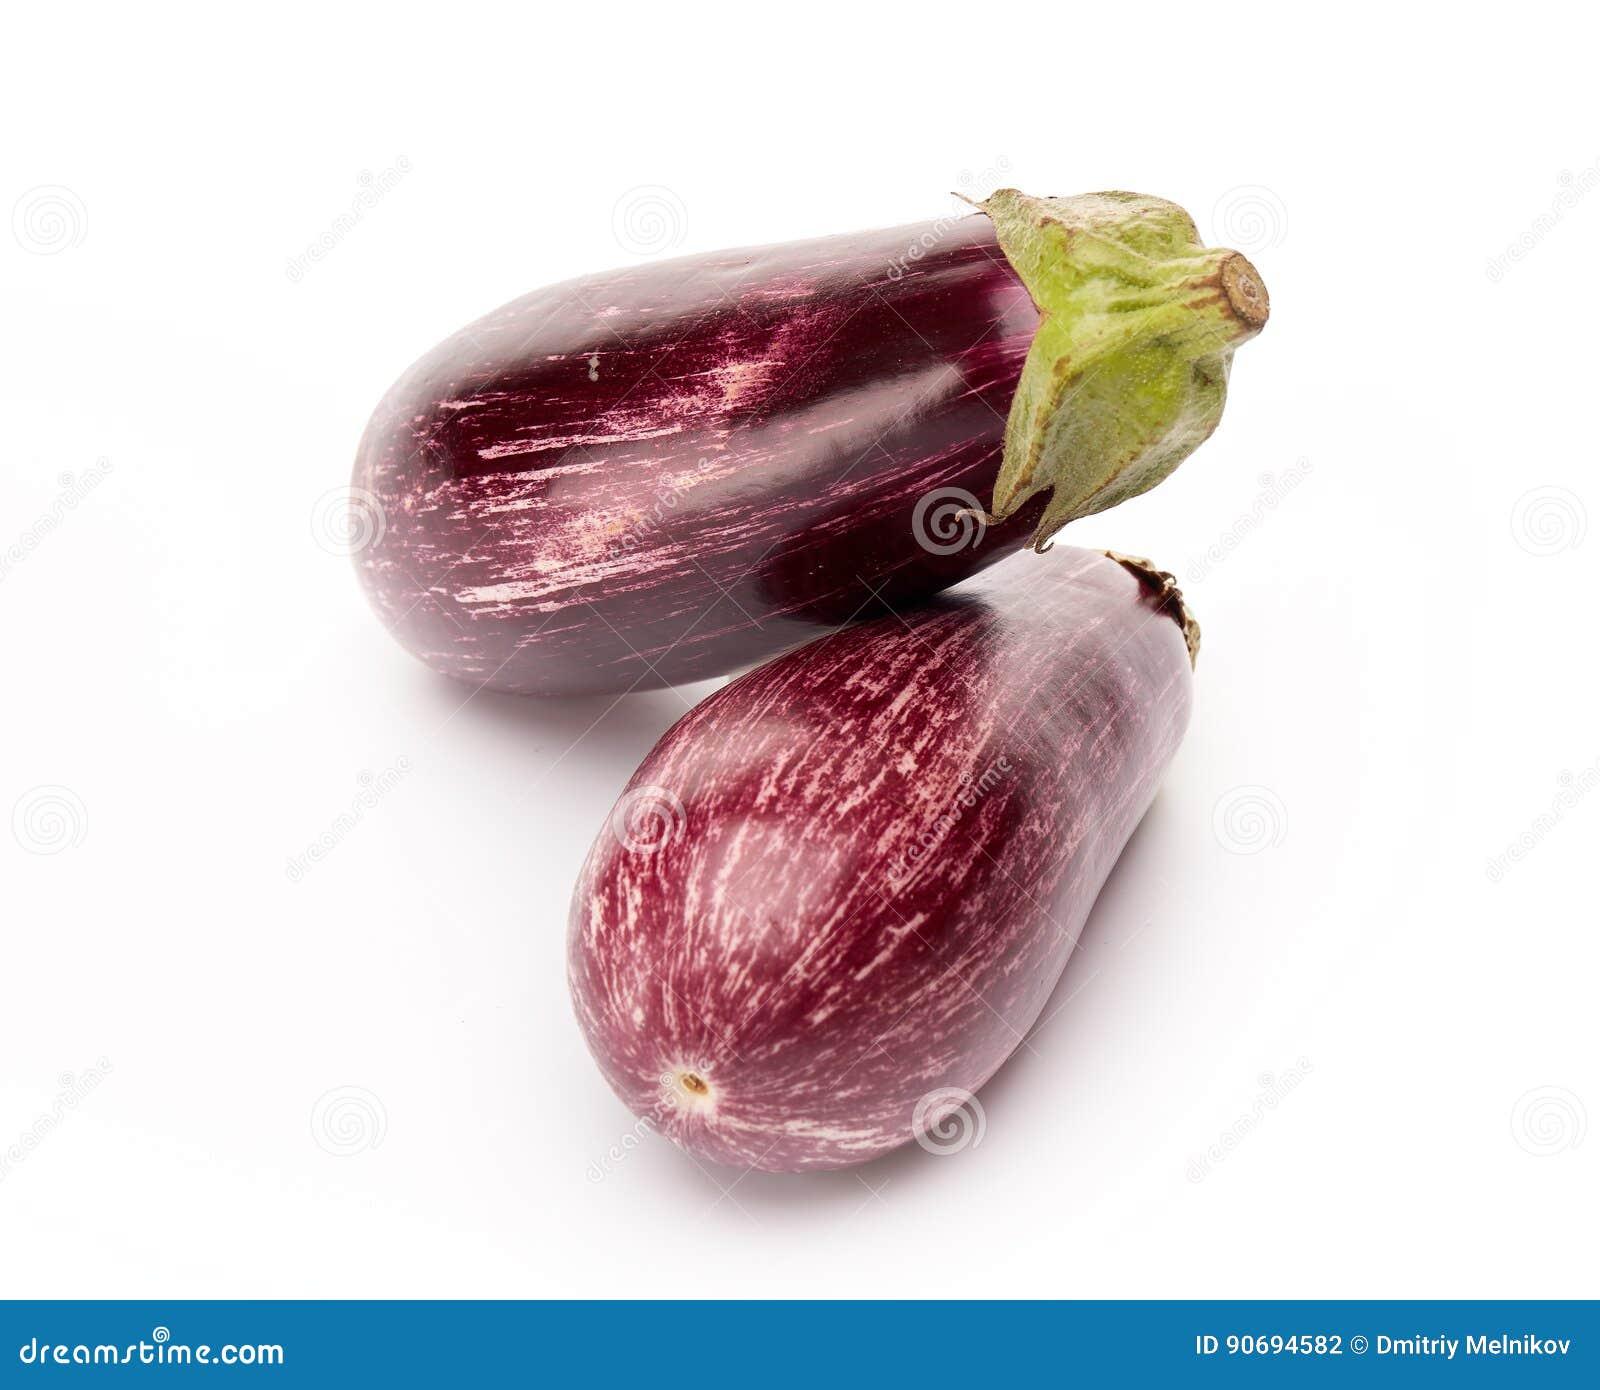 Two fresh graffiti eggplants aubergine on a white background